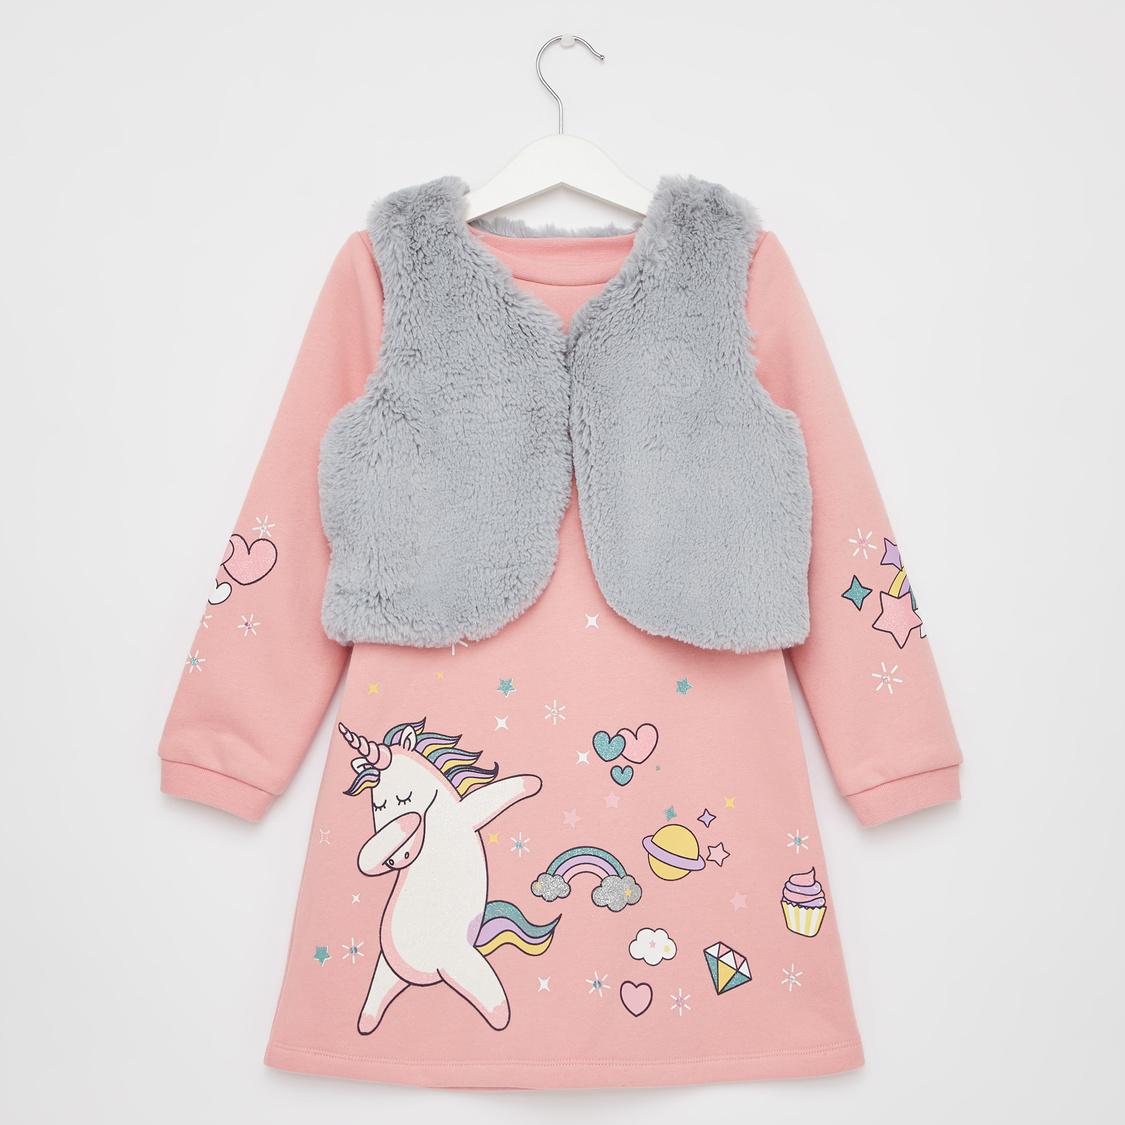 Unicorn Print Knee Length Dress with Textured Jacket